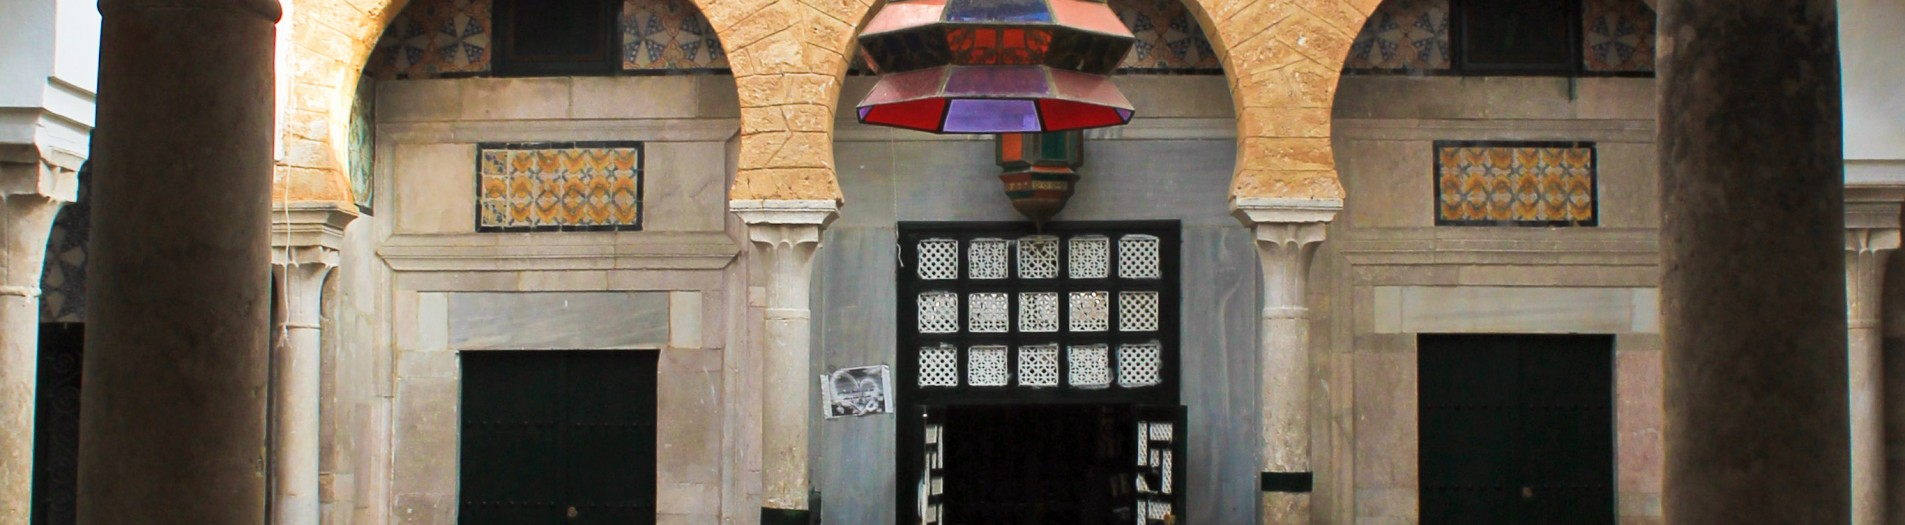 La médina de Tunis, première partie